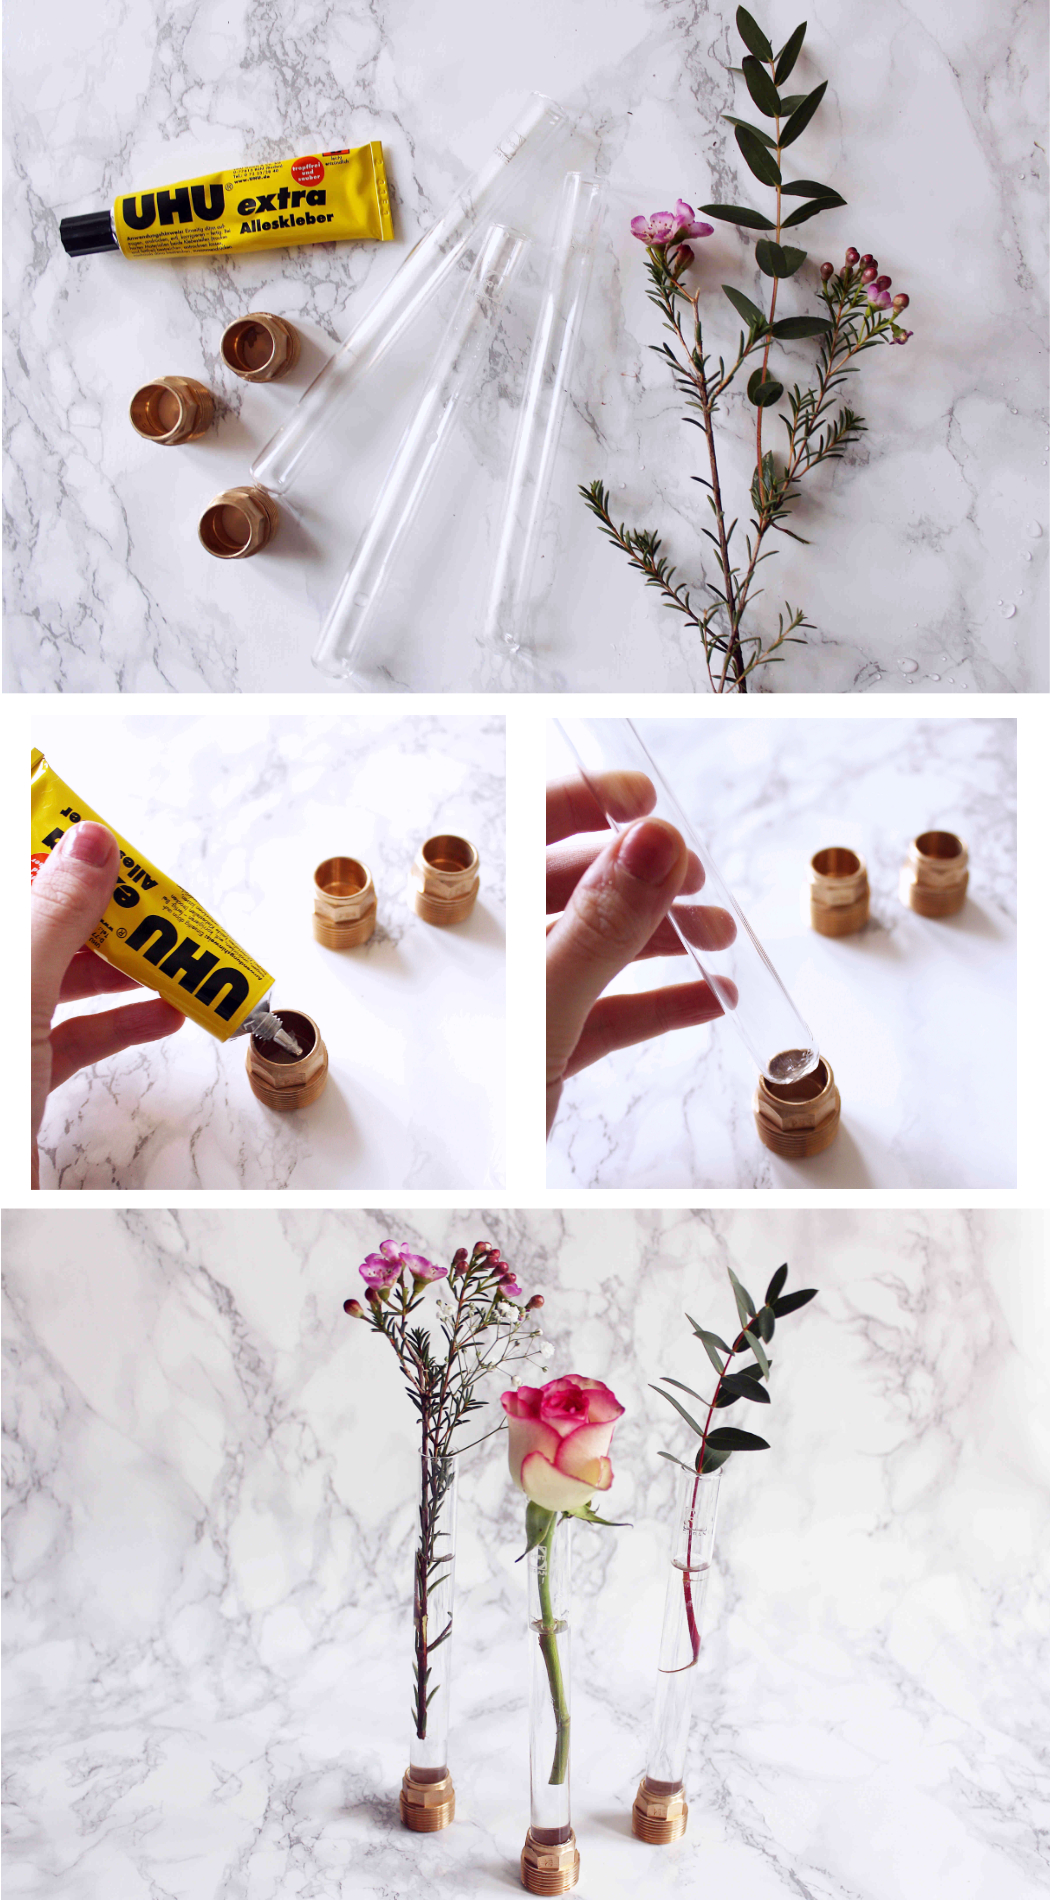 DIY Anleitung Reagenzglas Vase Selber Machen